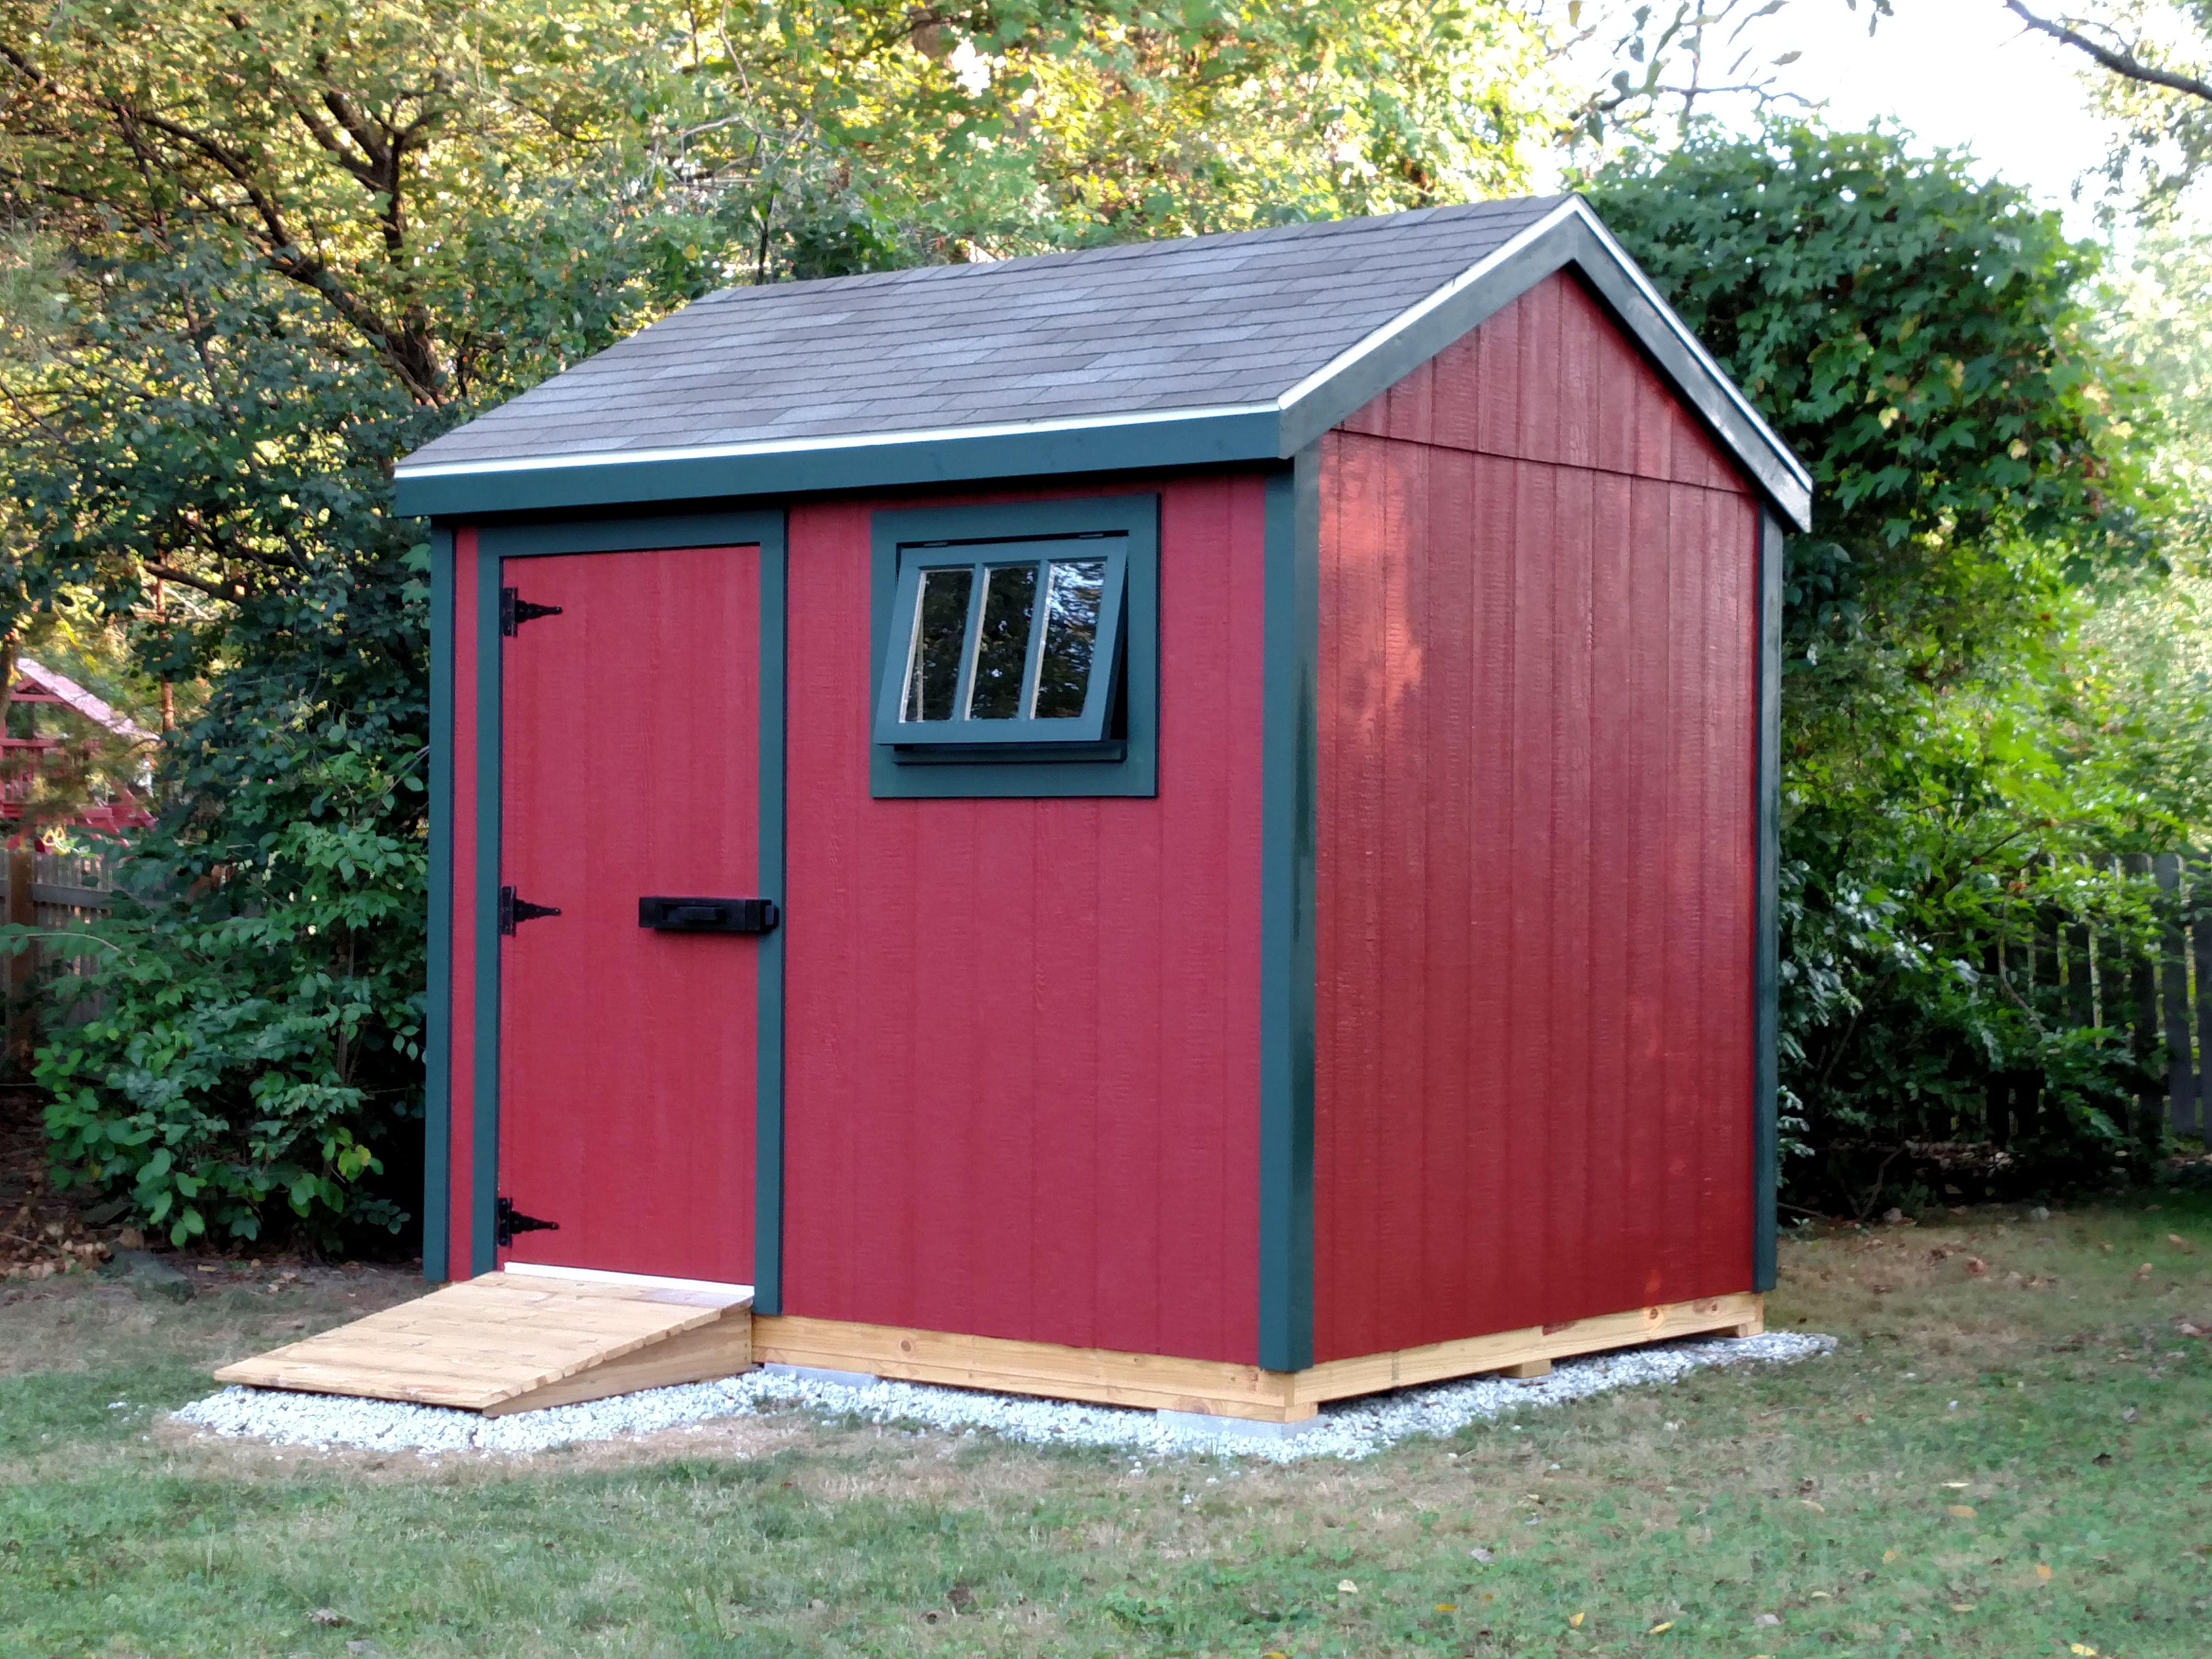 Garden Sheds 8x10 8x10 garden shed | my projects | pinterest | gardens, garden sheds